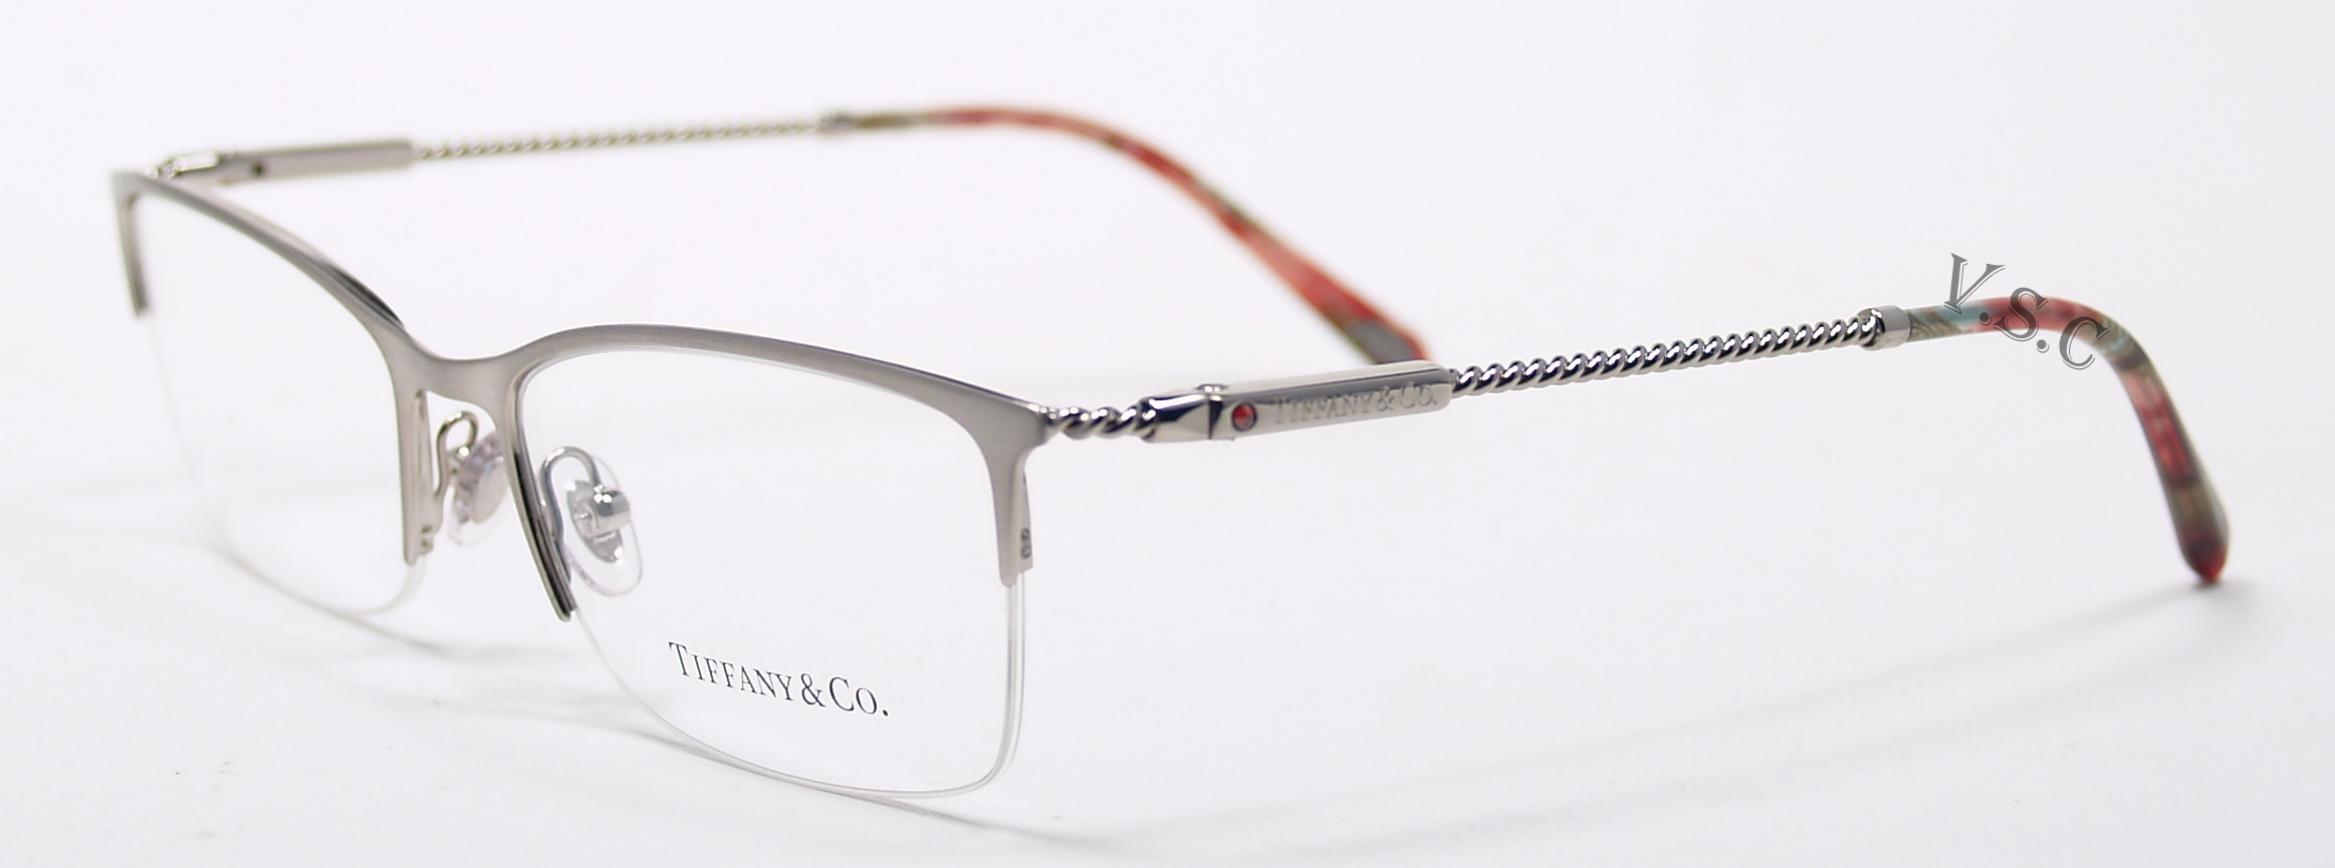 86f282fdf1e9 woodnet  Tiffany eyeglass frame black × Tiffany blue Tiffany  amp  Co. eyeglasses  glasses 0TF-2061-8055 □ □ price □ □ branded mens  amp  .